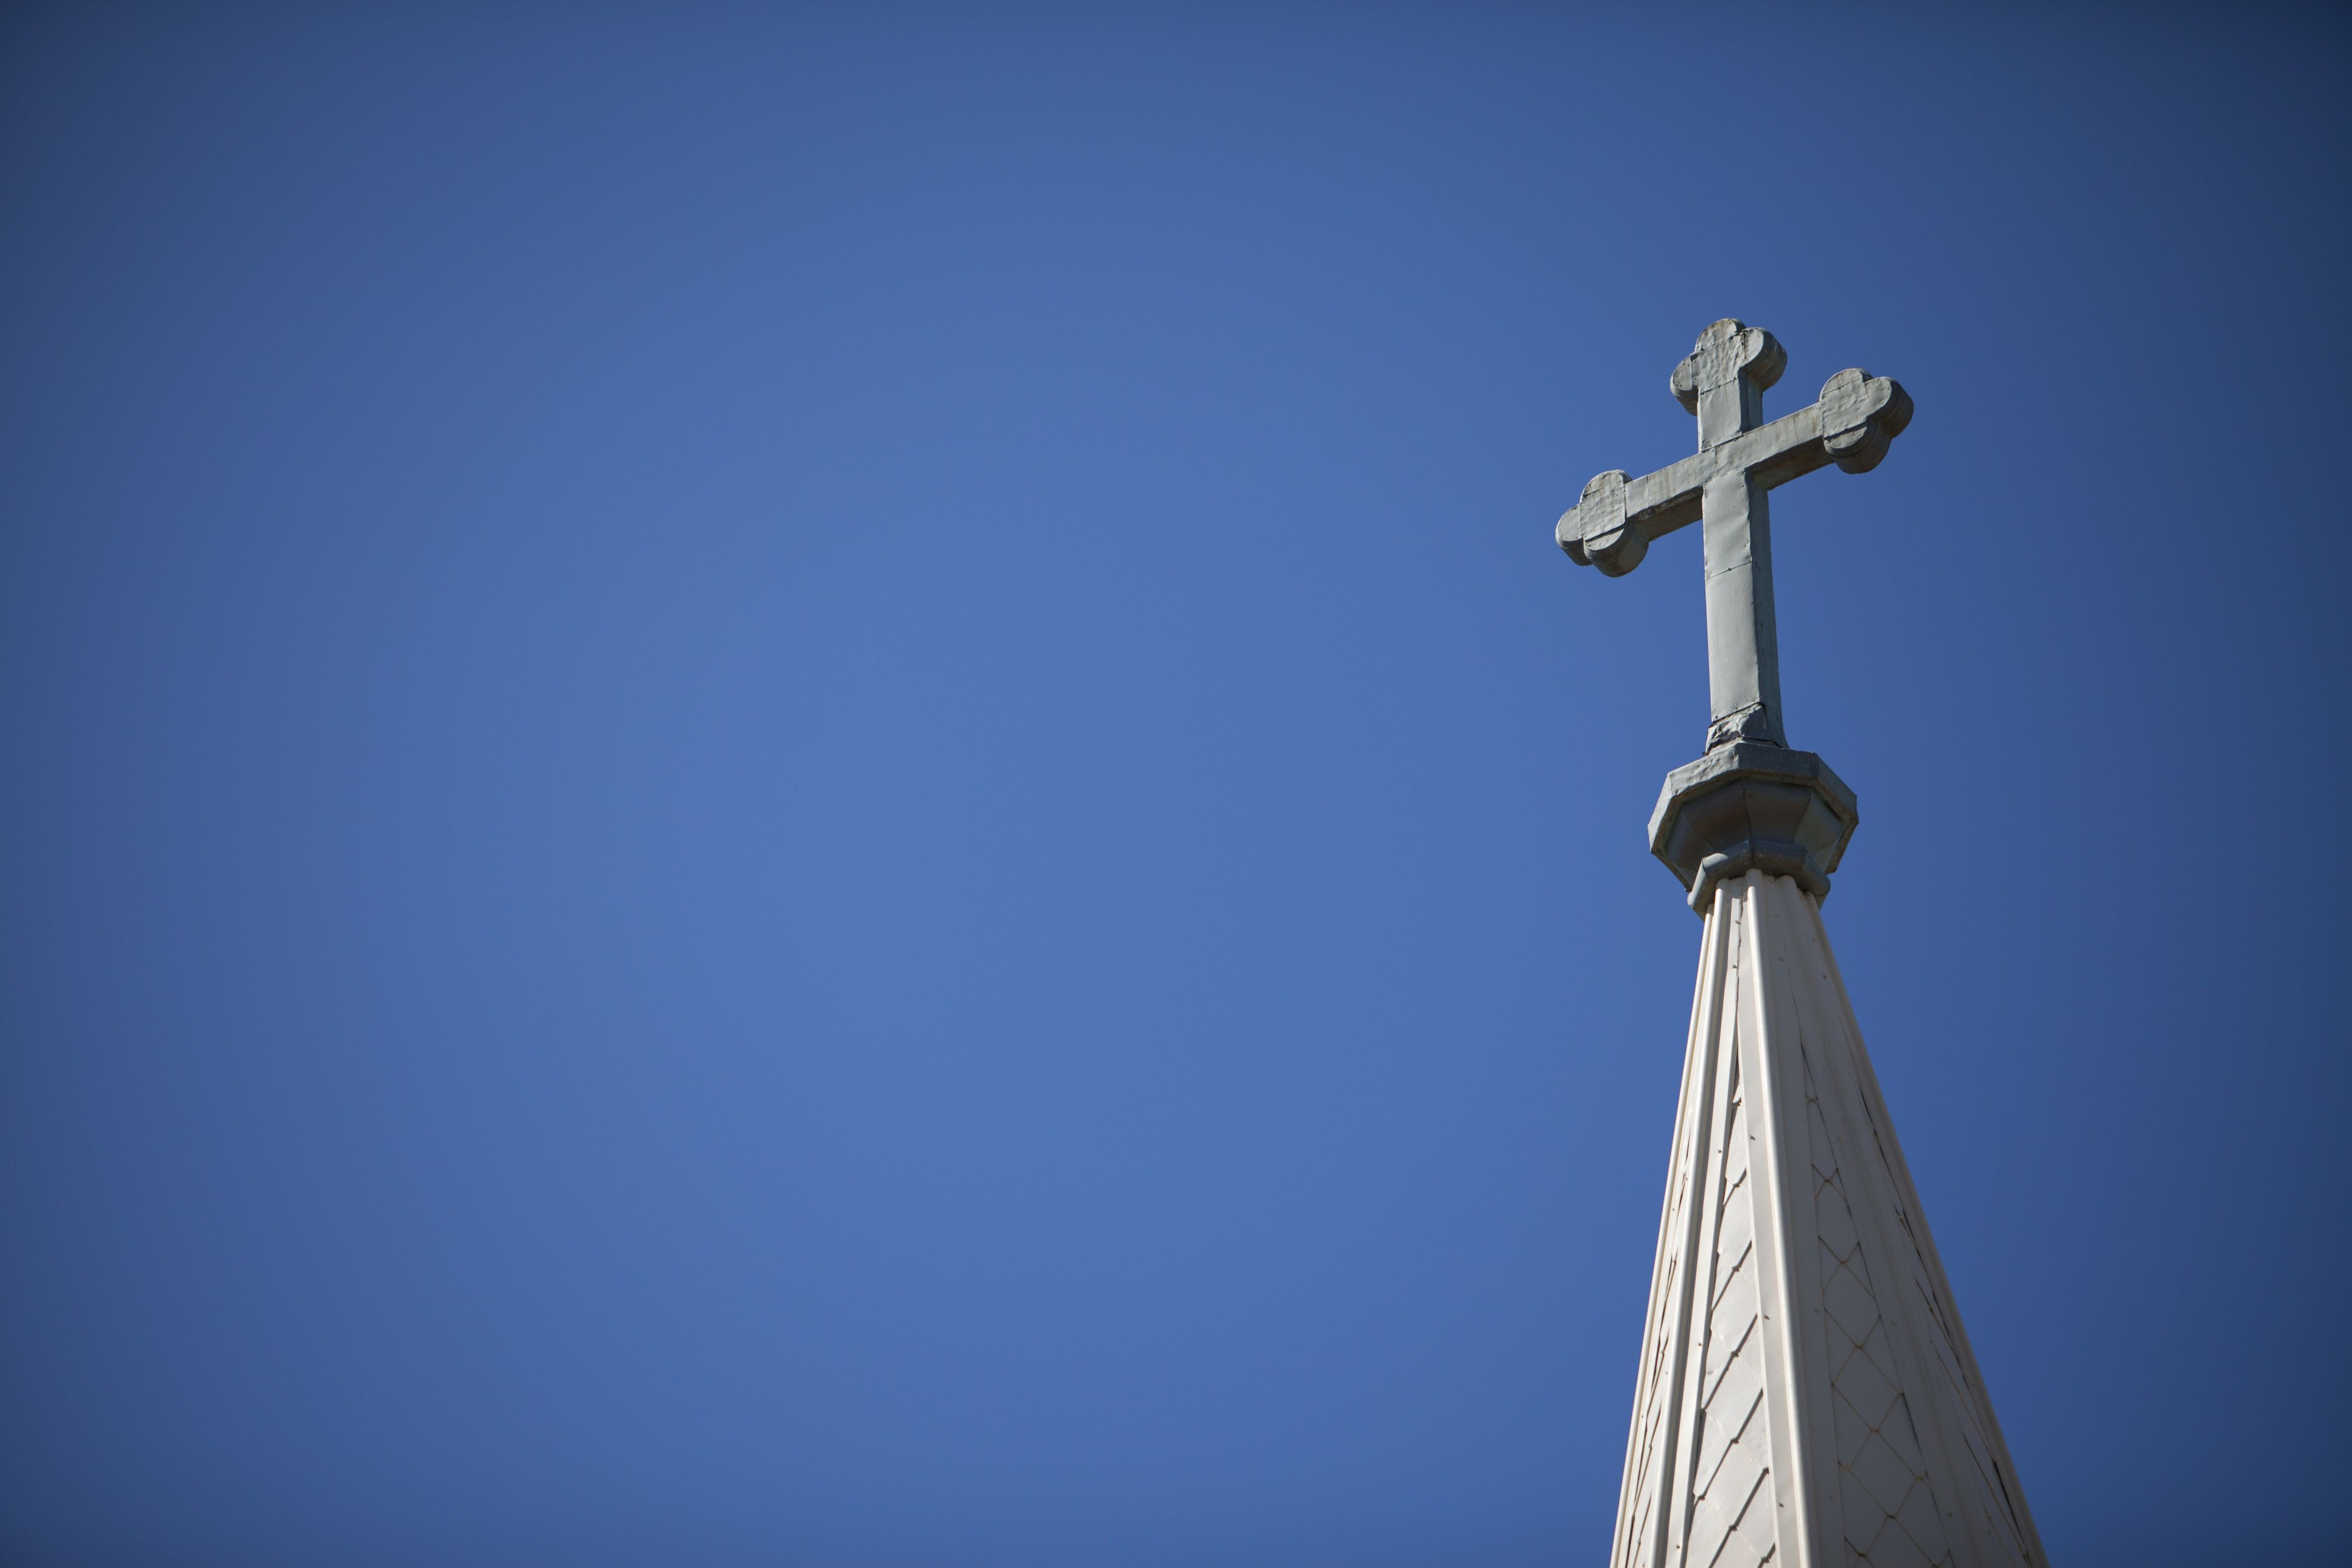 Considering leaving the catholic church